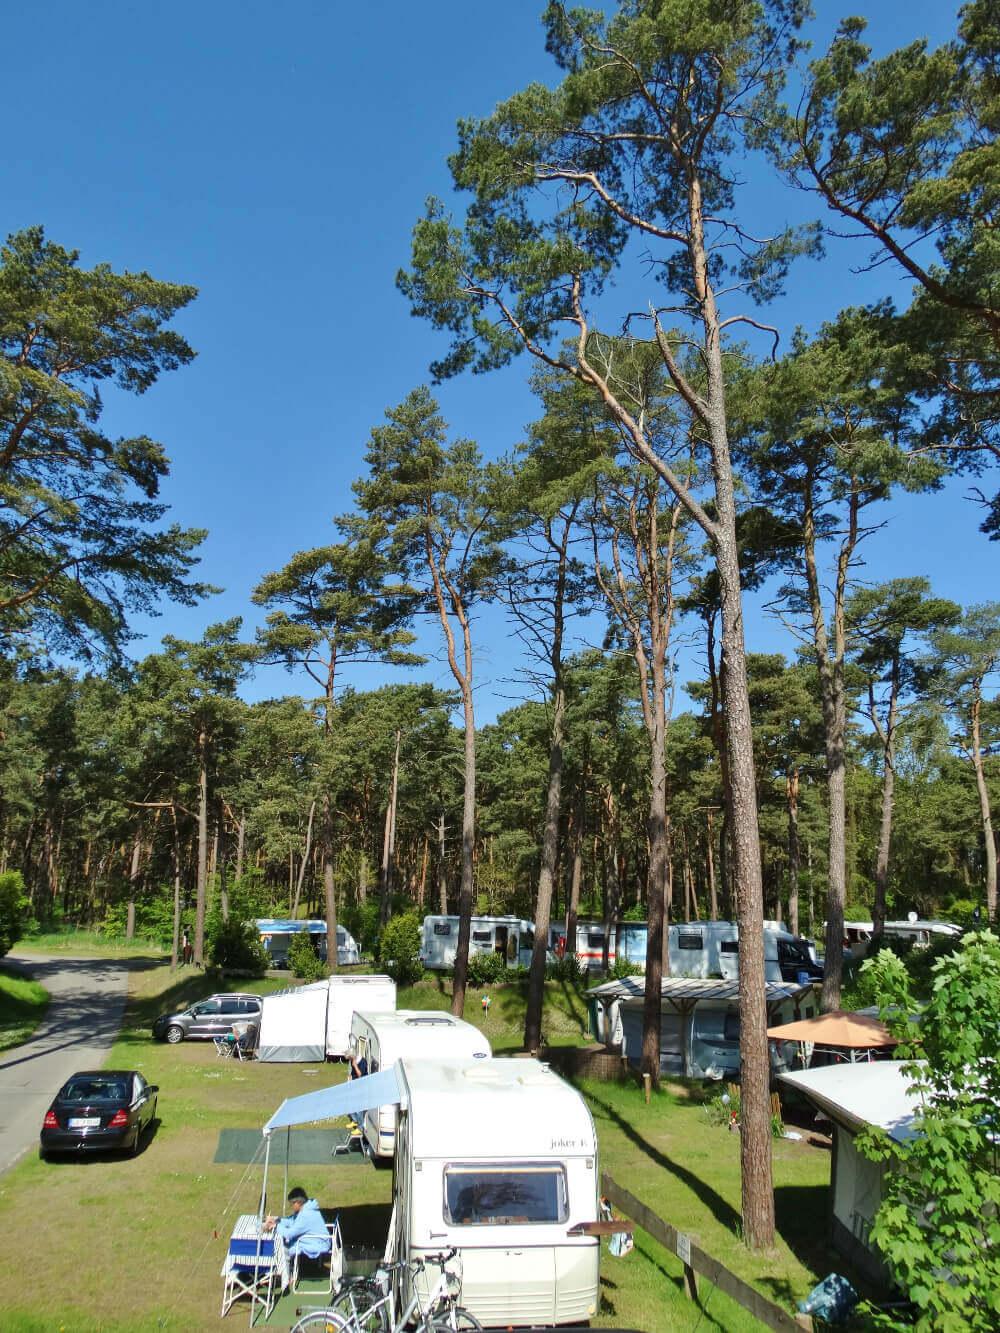 Parzellen auf dem Campingplatz Ostseeblick